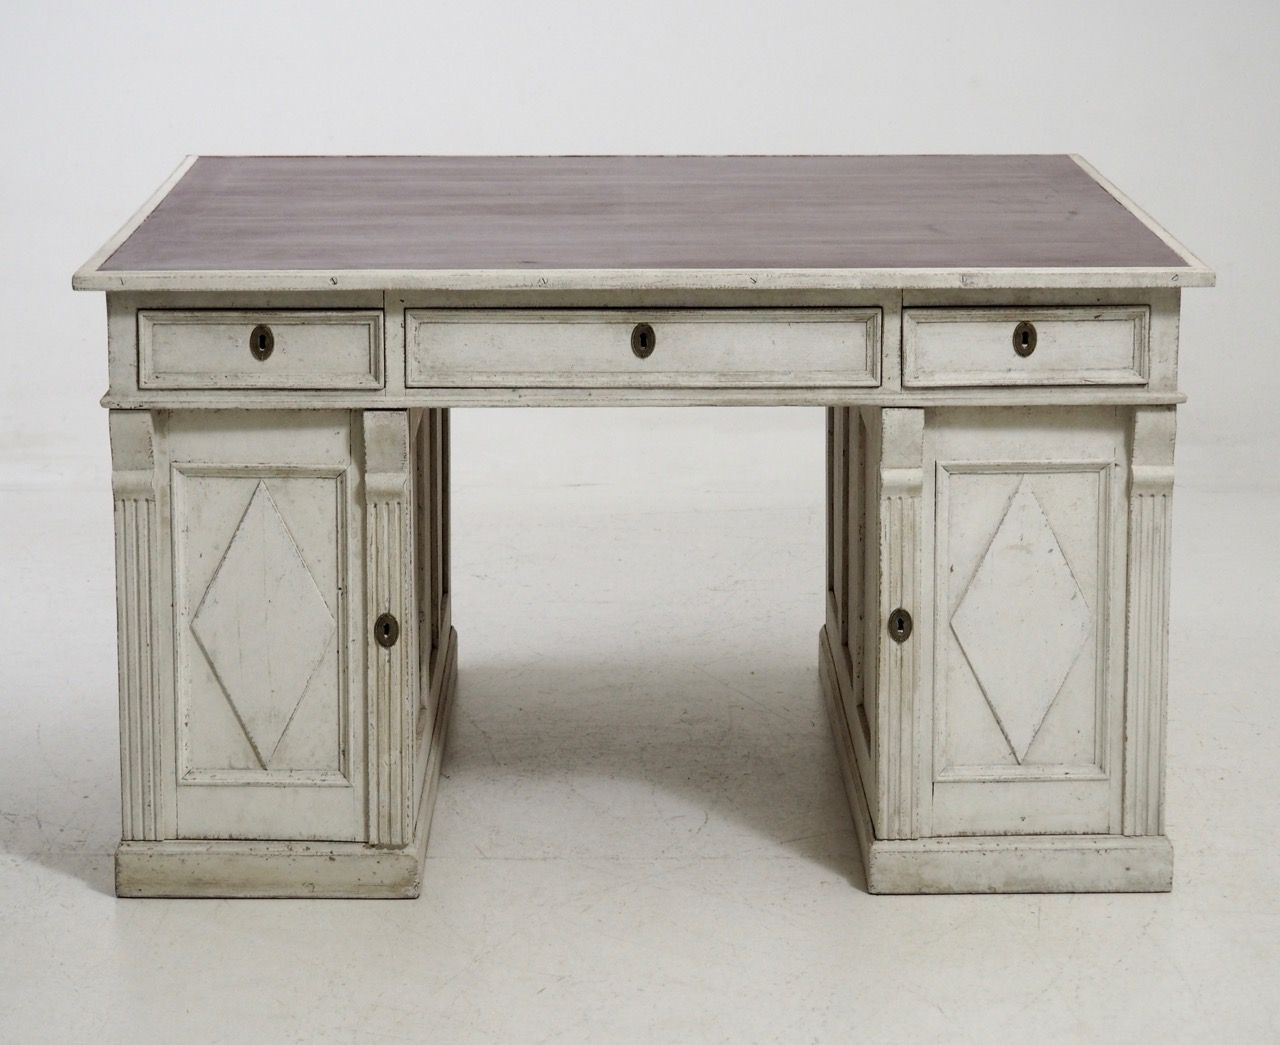 Antique Swedish Freestanding Partner's Desk - Antique Swedish Freestanding Partner's Desk Desks, Partners Desk